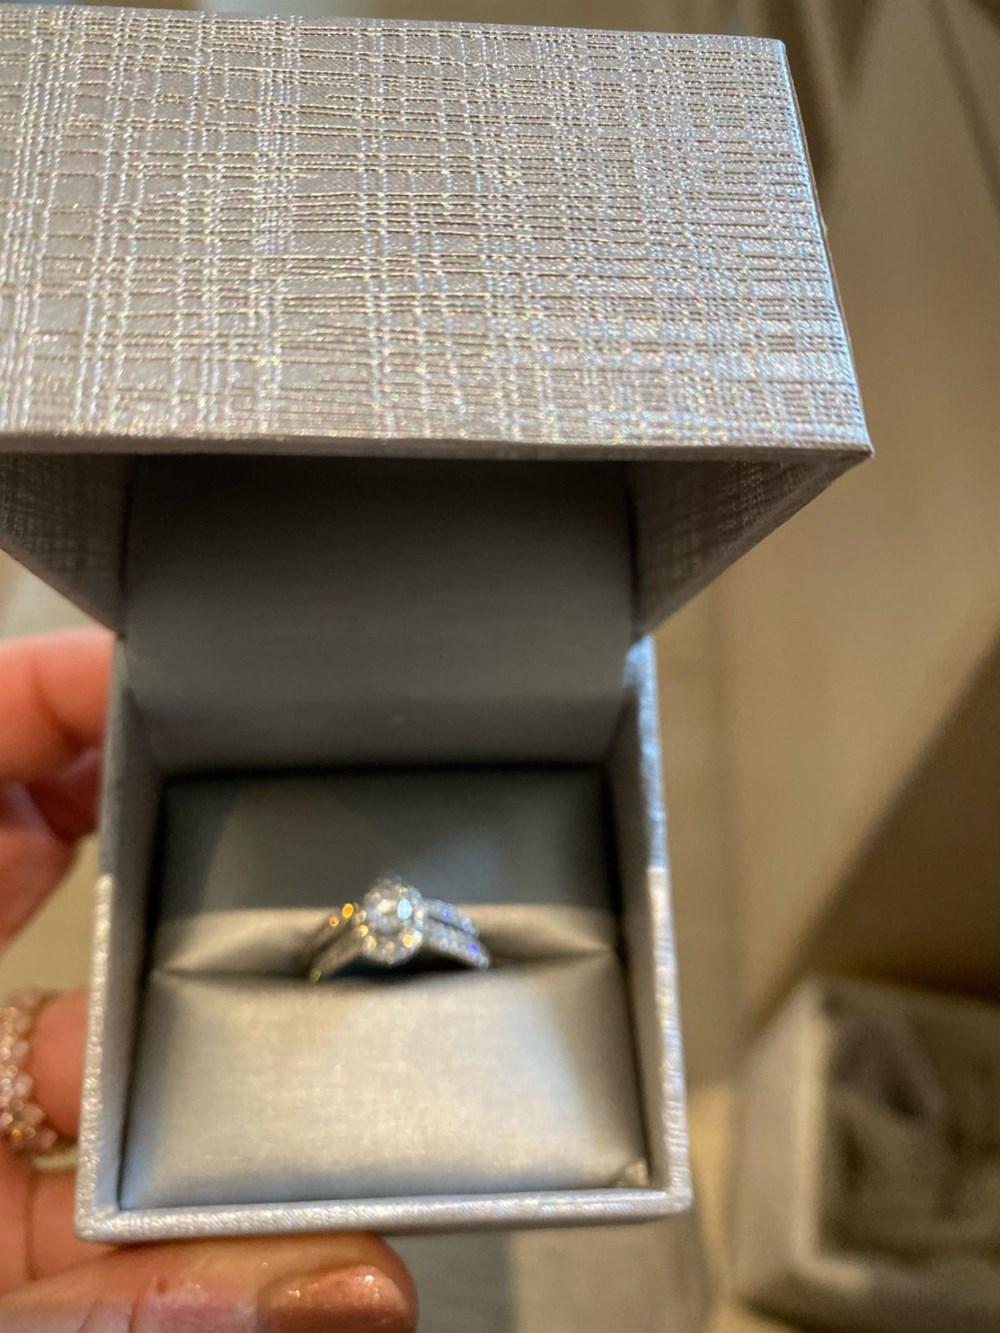 Kim Kardashian'a elmas yüzük ve doğum kontrol hapıyla taciz - 2